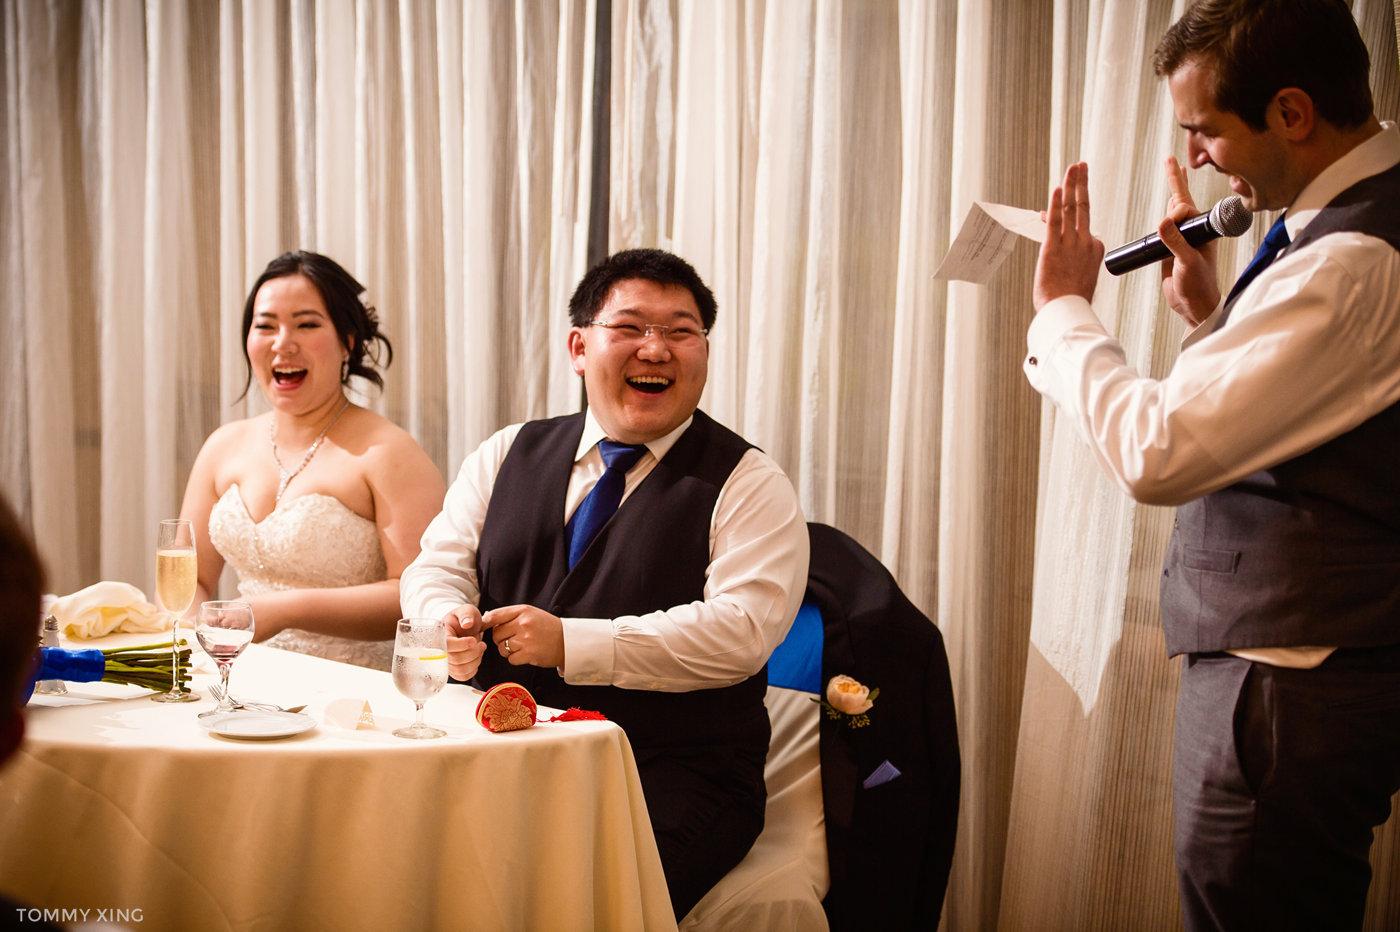 STANFORD MEMORIAL CHURCH WEDDING - Wenjie & Chengcheng - SAN FRANCISCO BAY AREA 斯坦福教堂婚礼跟拍 - 洛杉矶婚礼婚纱照摄影师 Tommy Xing Photography185.jpg